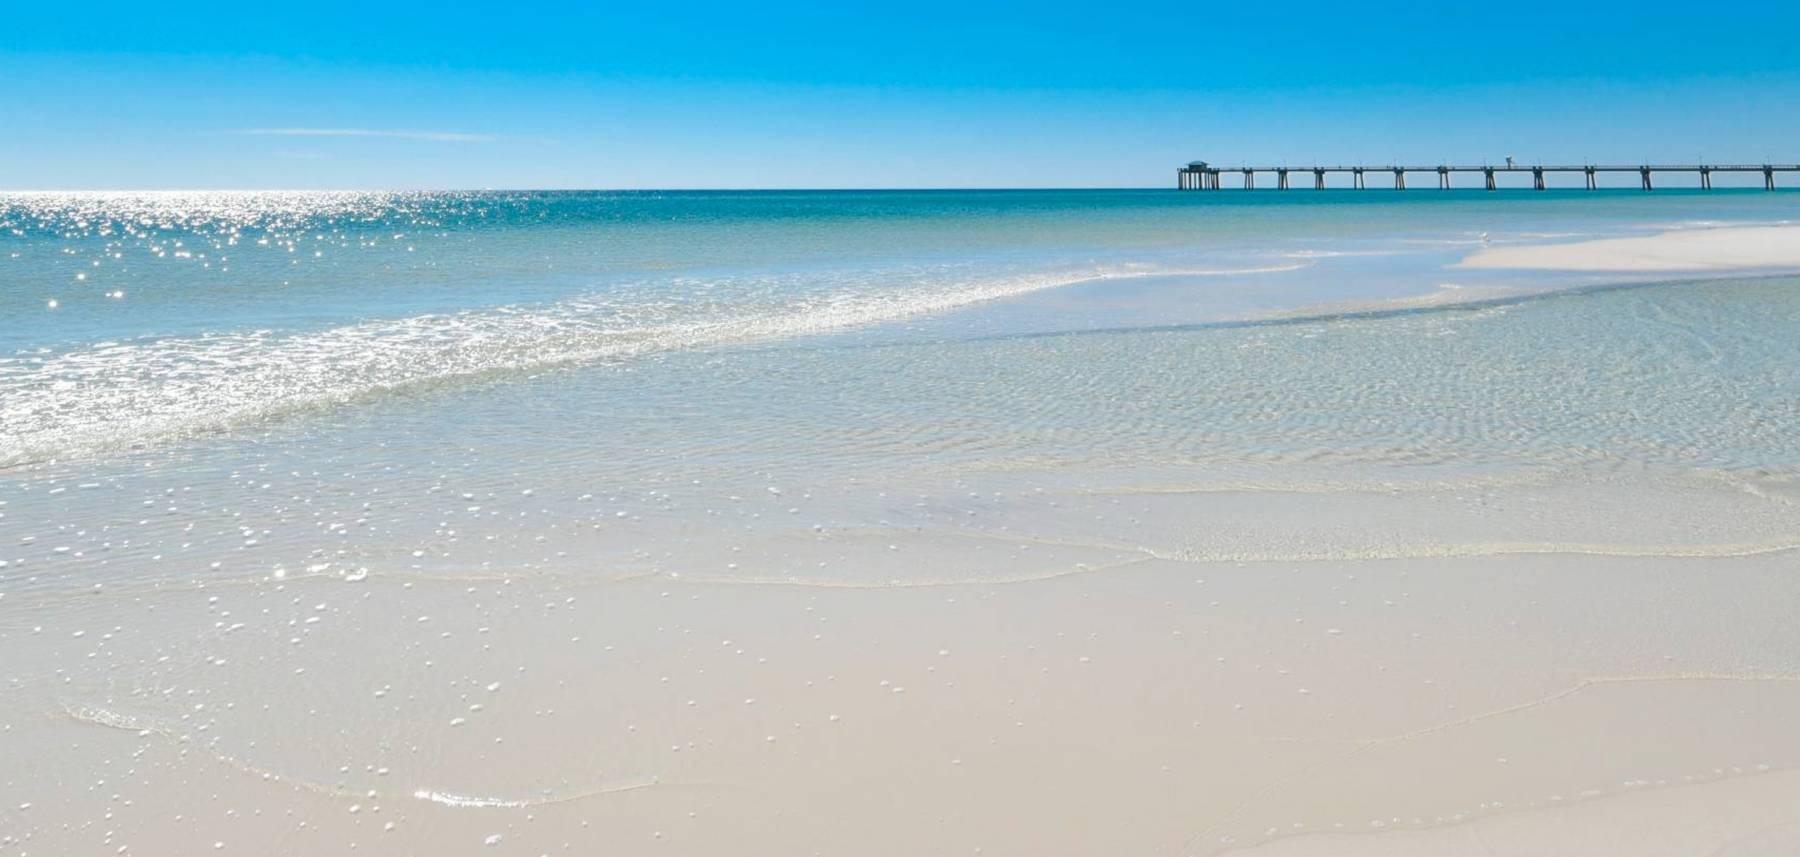 Compass Resorts | Vacation Rentals in Destin & the Emerald Coast